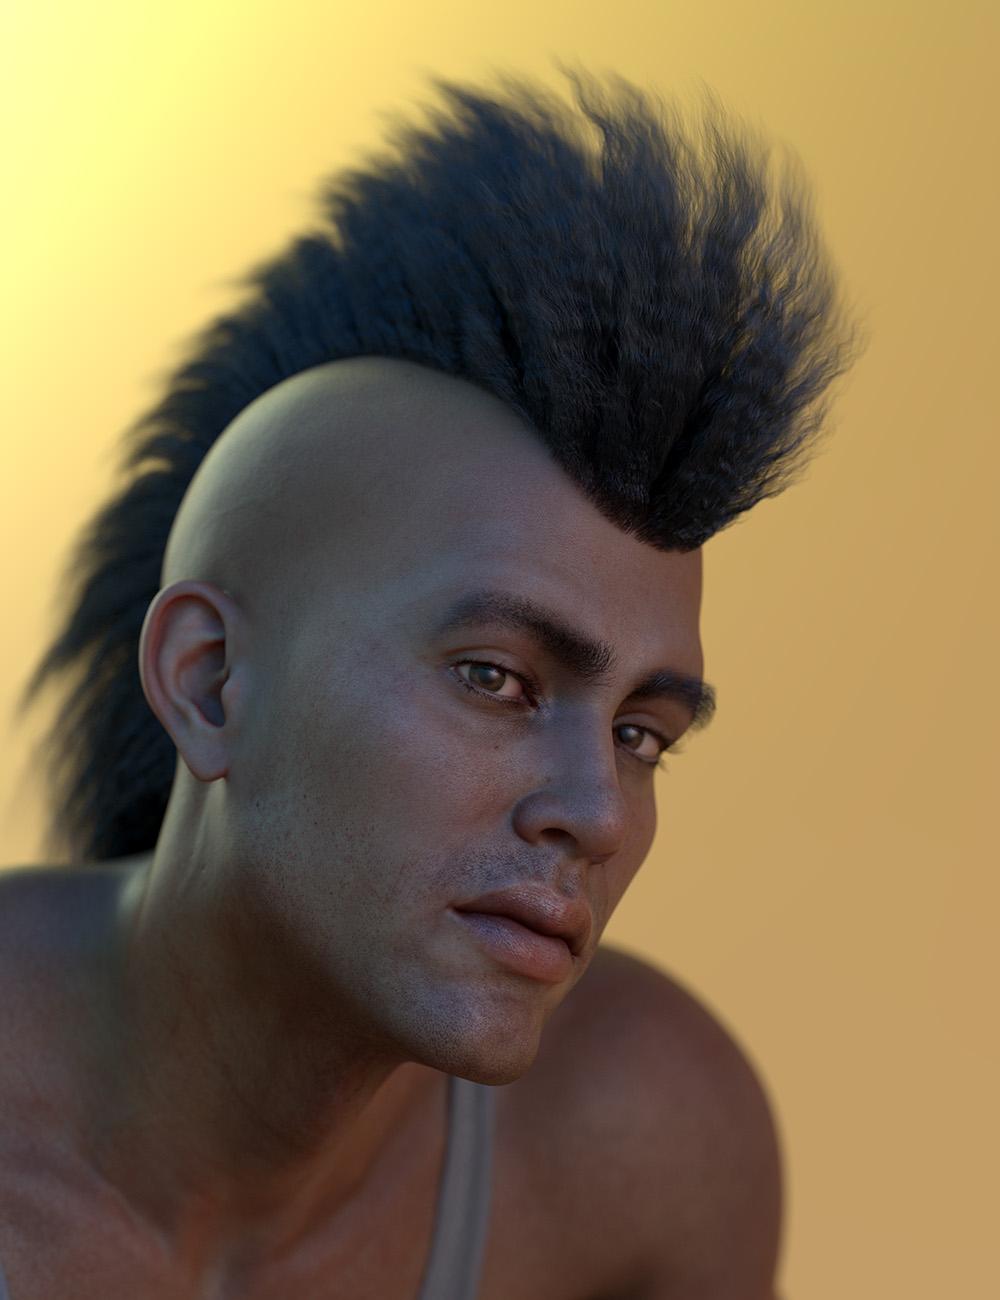 Oso Mane for Genesis 8.1 Male by: Oso3D, 3D Models by Daz 3D